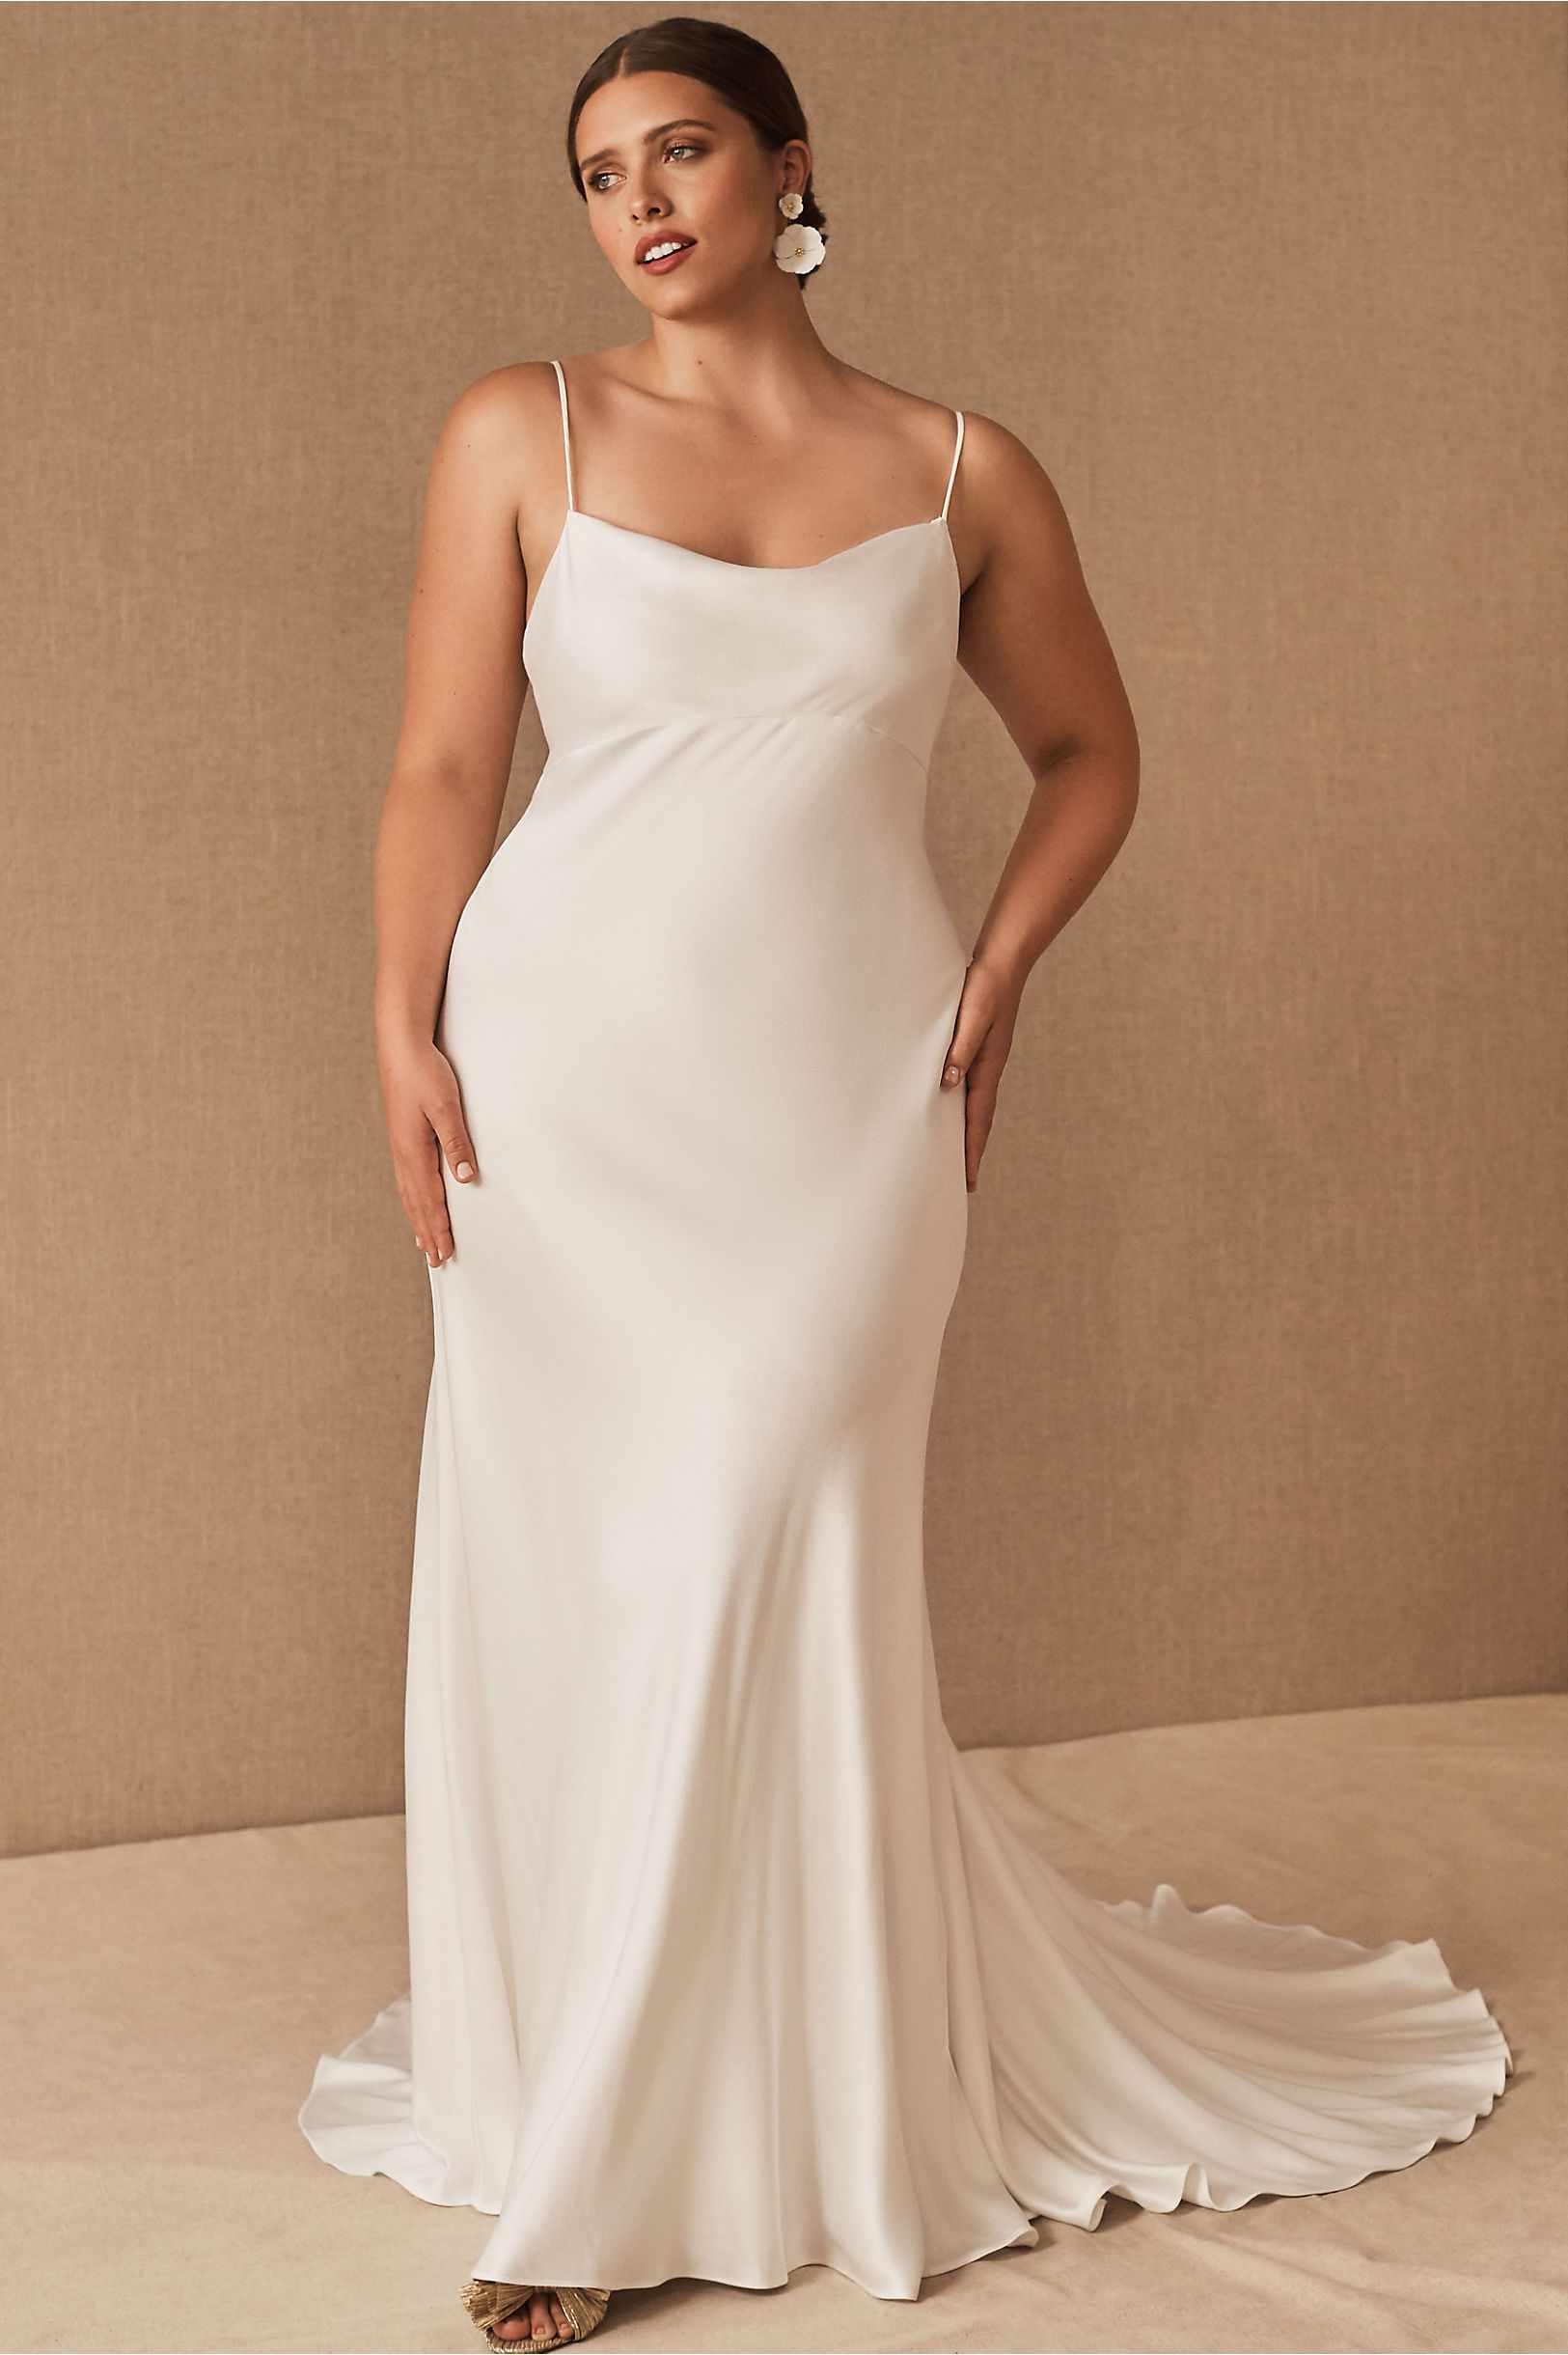 Vestido de novia lencero 2021, vestidos de novia 2021, tendencias para novias 2021, las tendencias en vestidos de novia 2021 - BHLDN - Wedding Hub - 01